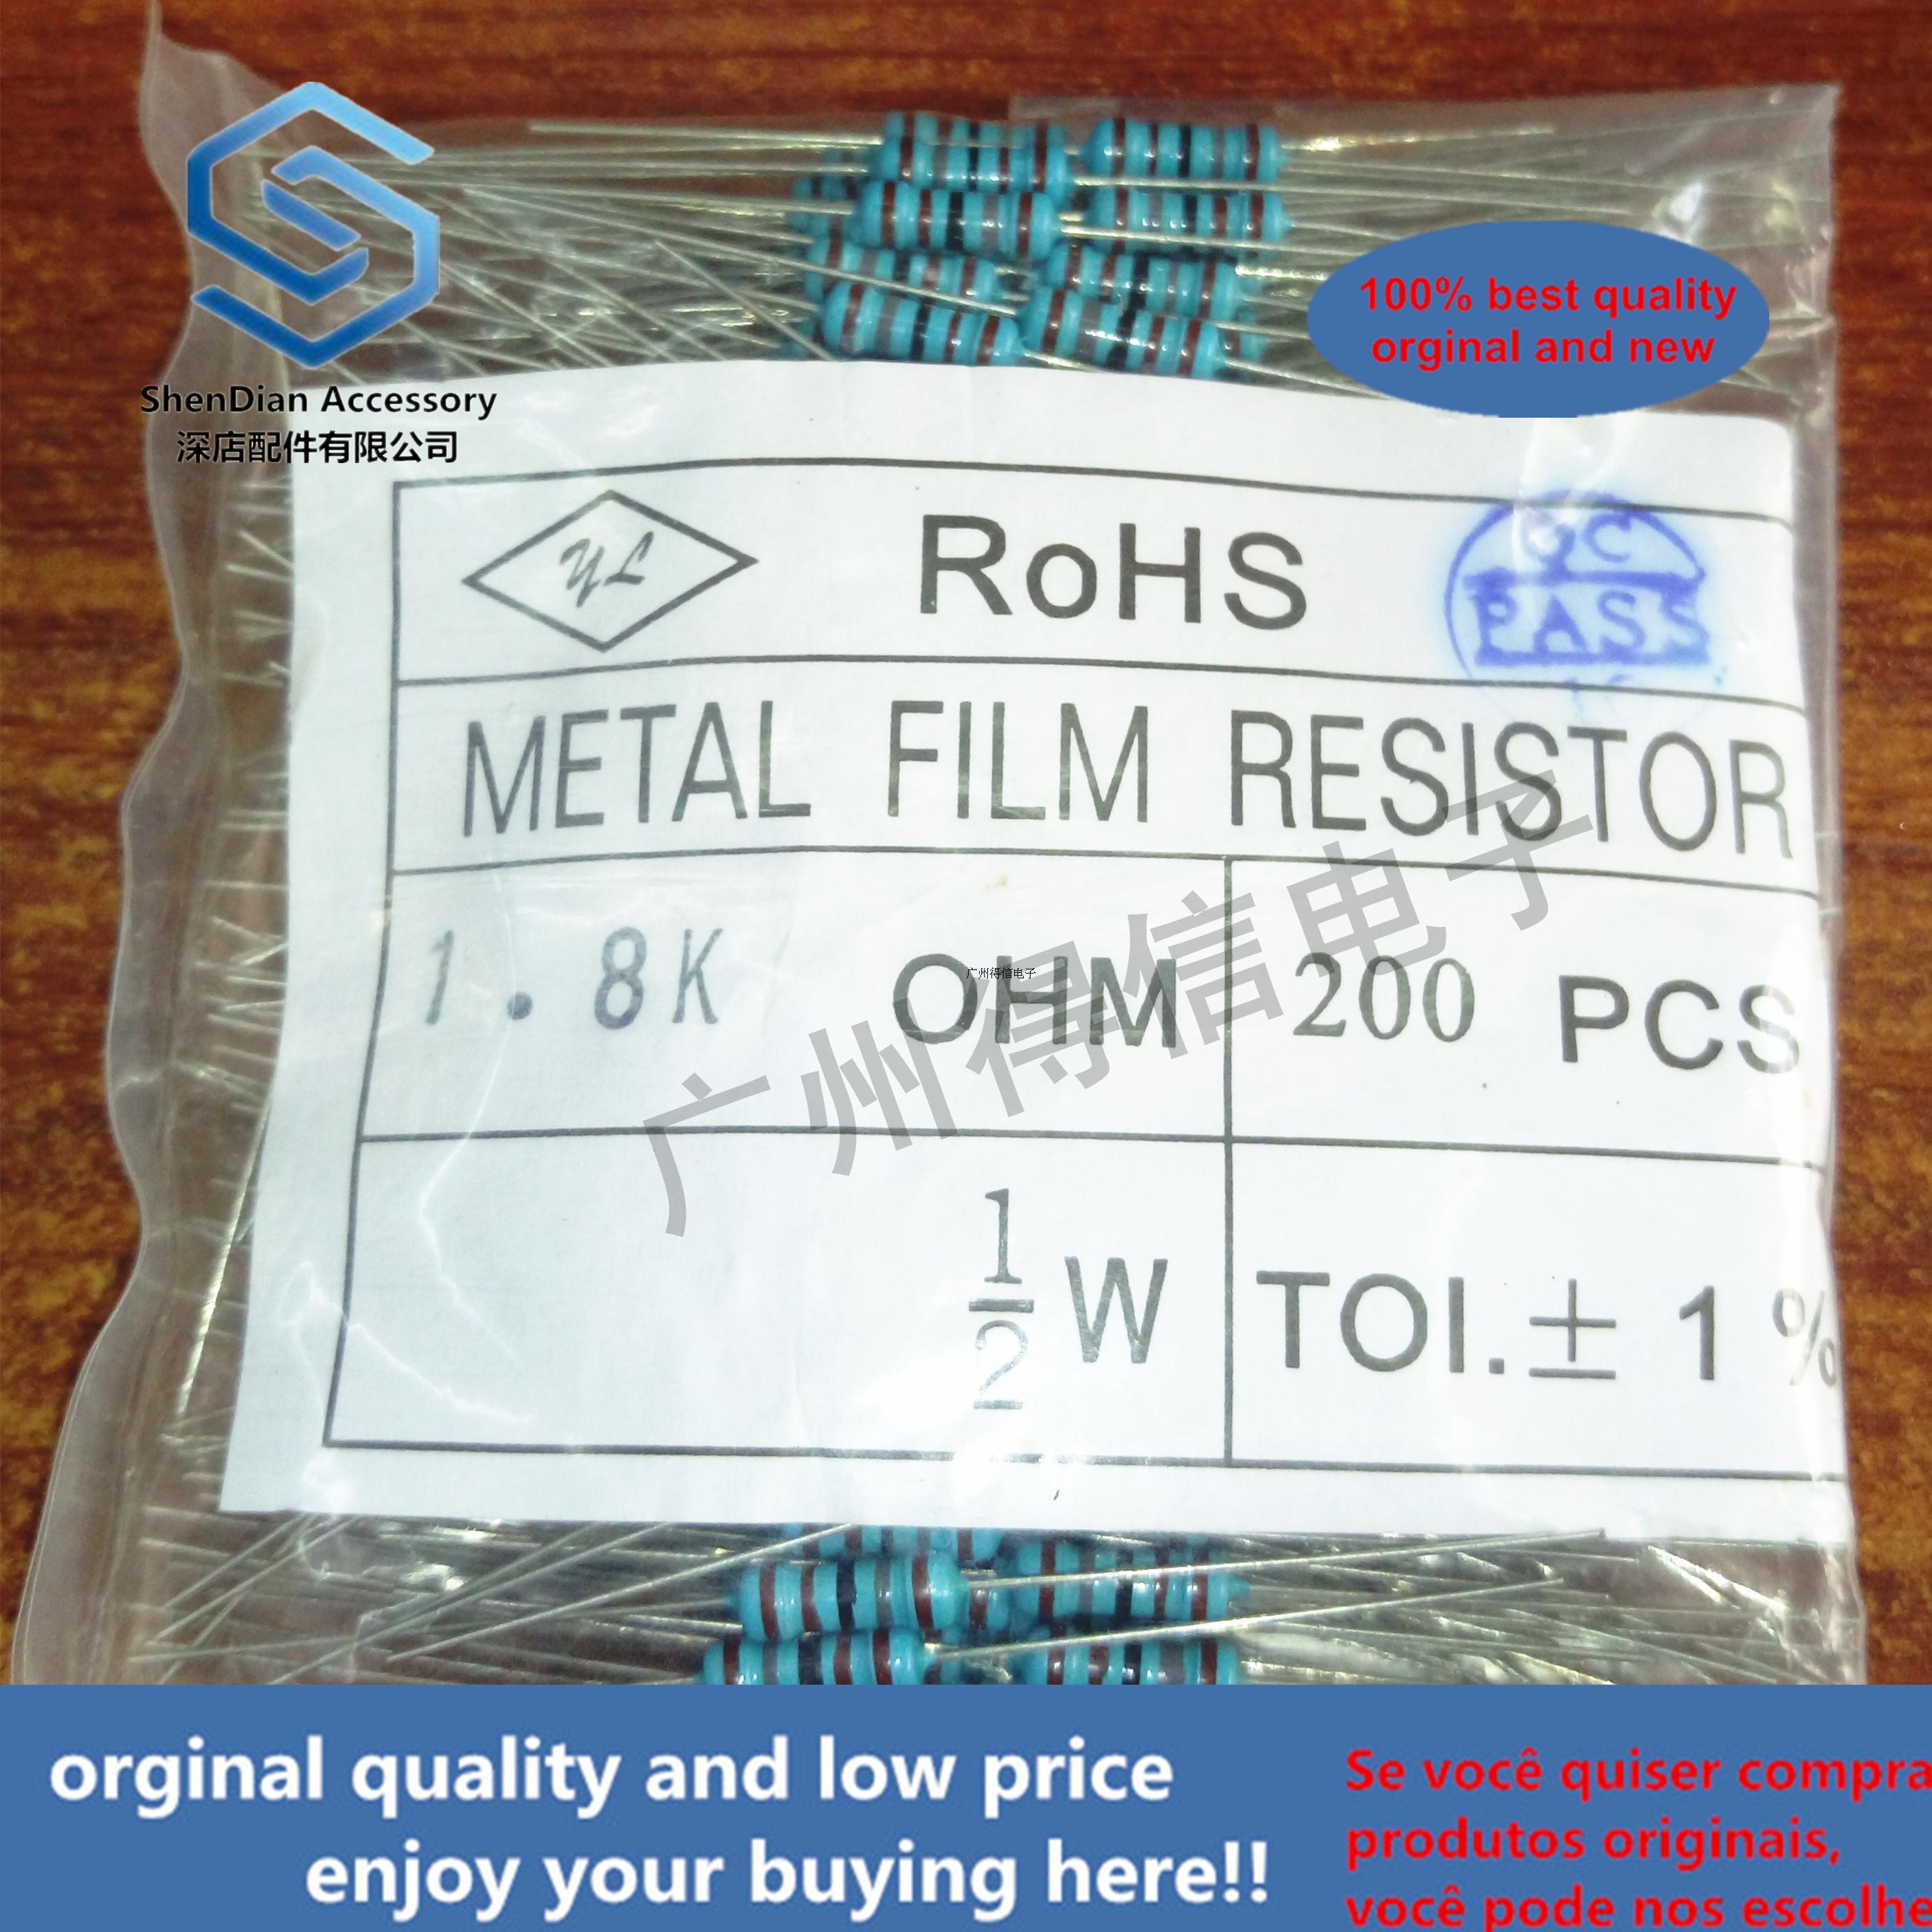 200pcs 1 / 2W 200K 1% Brand New Metal Film Iron Feet Resistance Bag 200 Pcs Per Pack